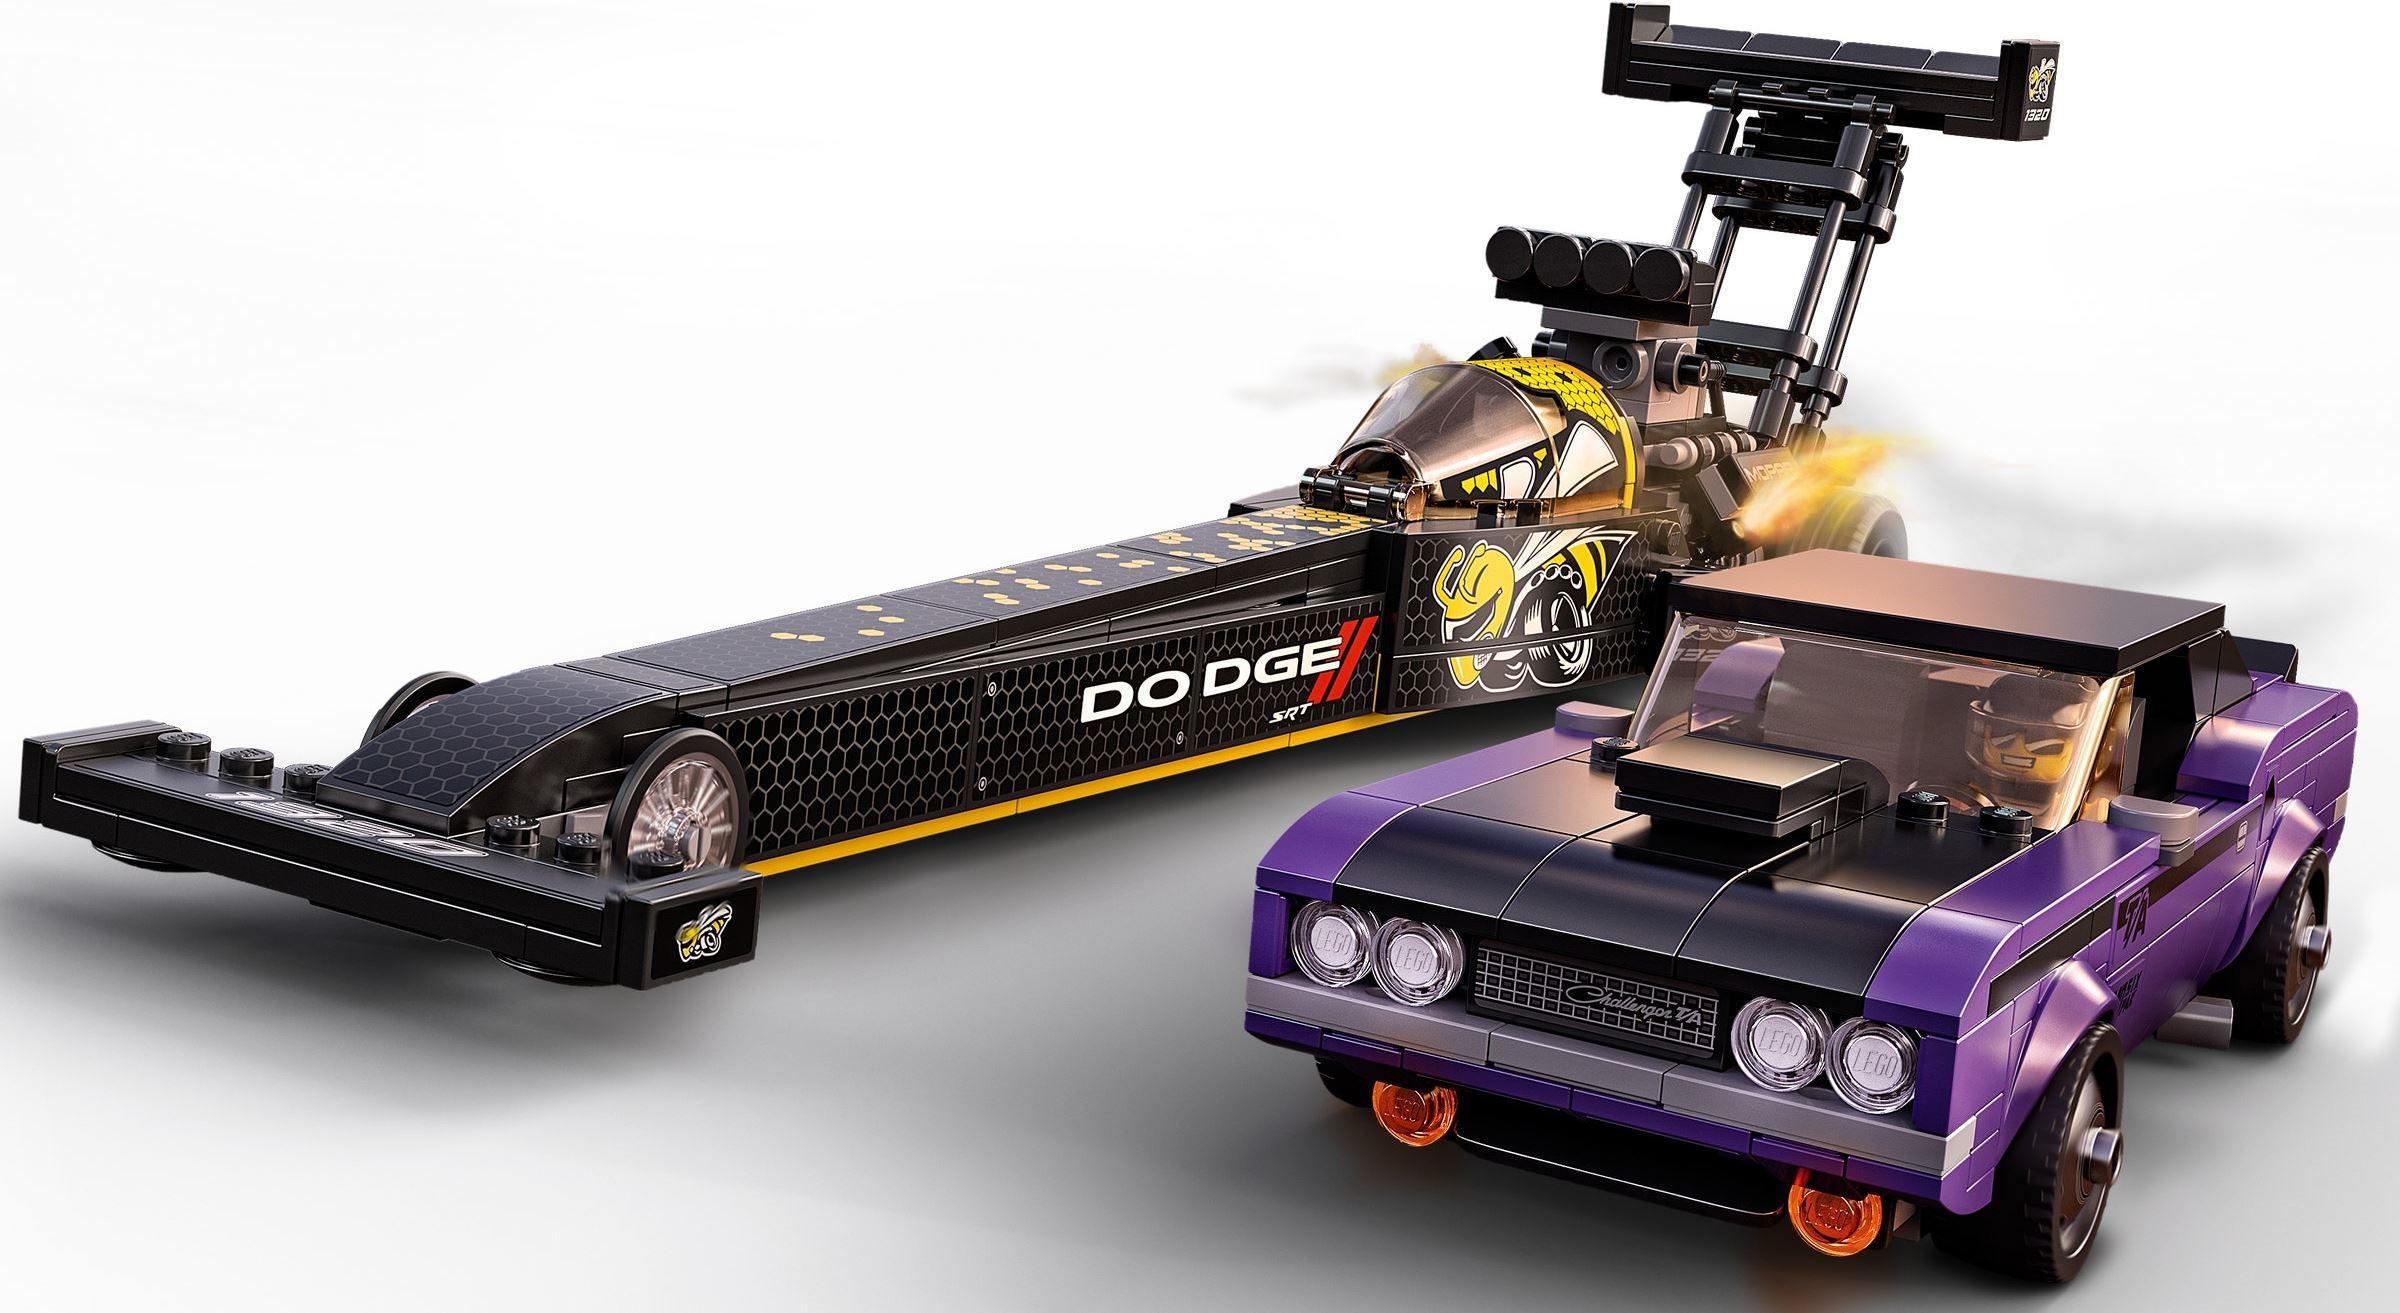 76904 LEGO Speed Champions Mopar Dodge//SRT Top Fuel Dragster and 1970 Dodge Challenger T/A